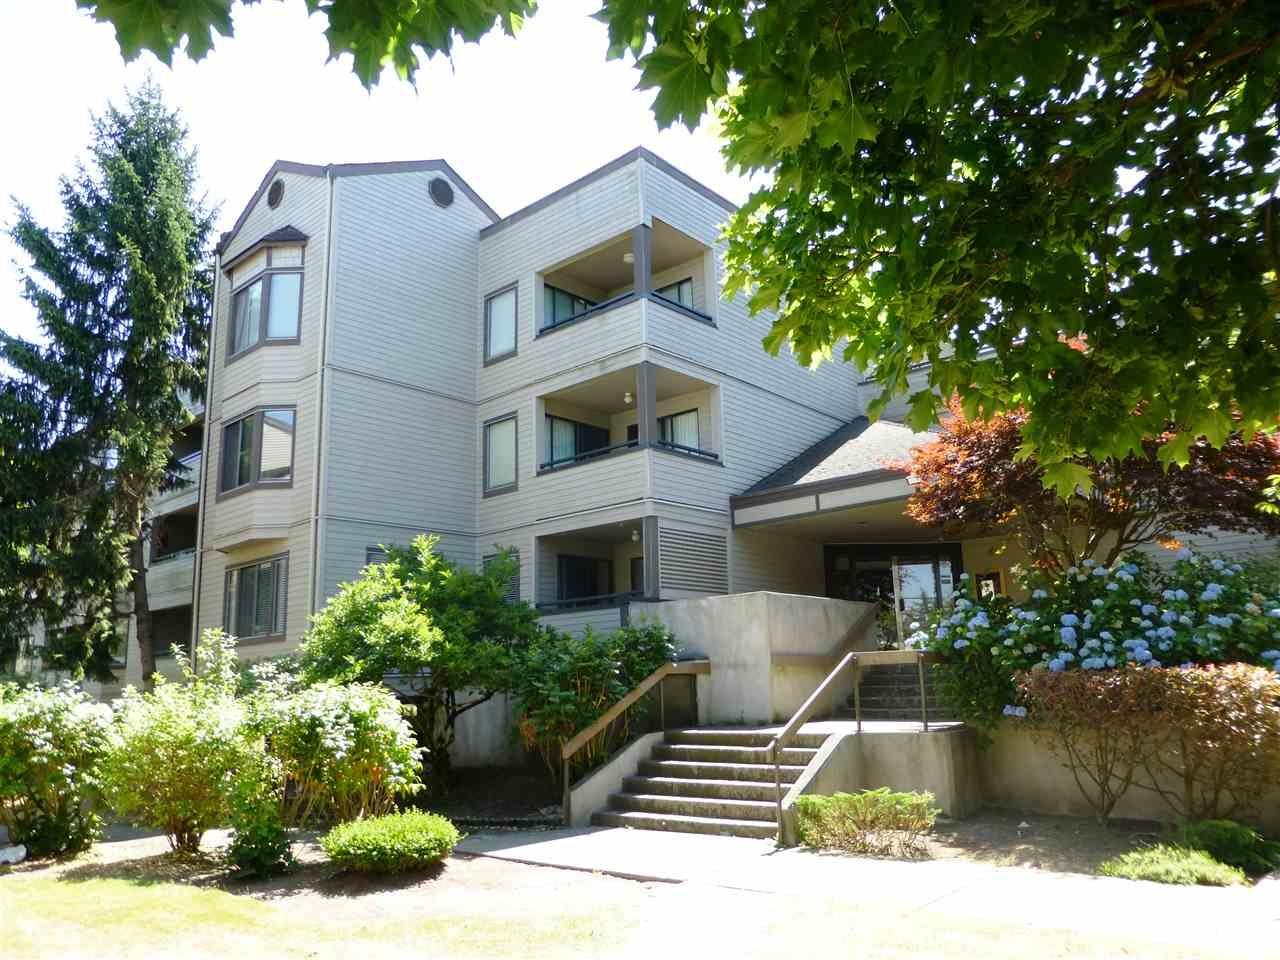 R2093532 - 202 5224 204TH STREET, Langley City, Langley, BC - Apartment Unit